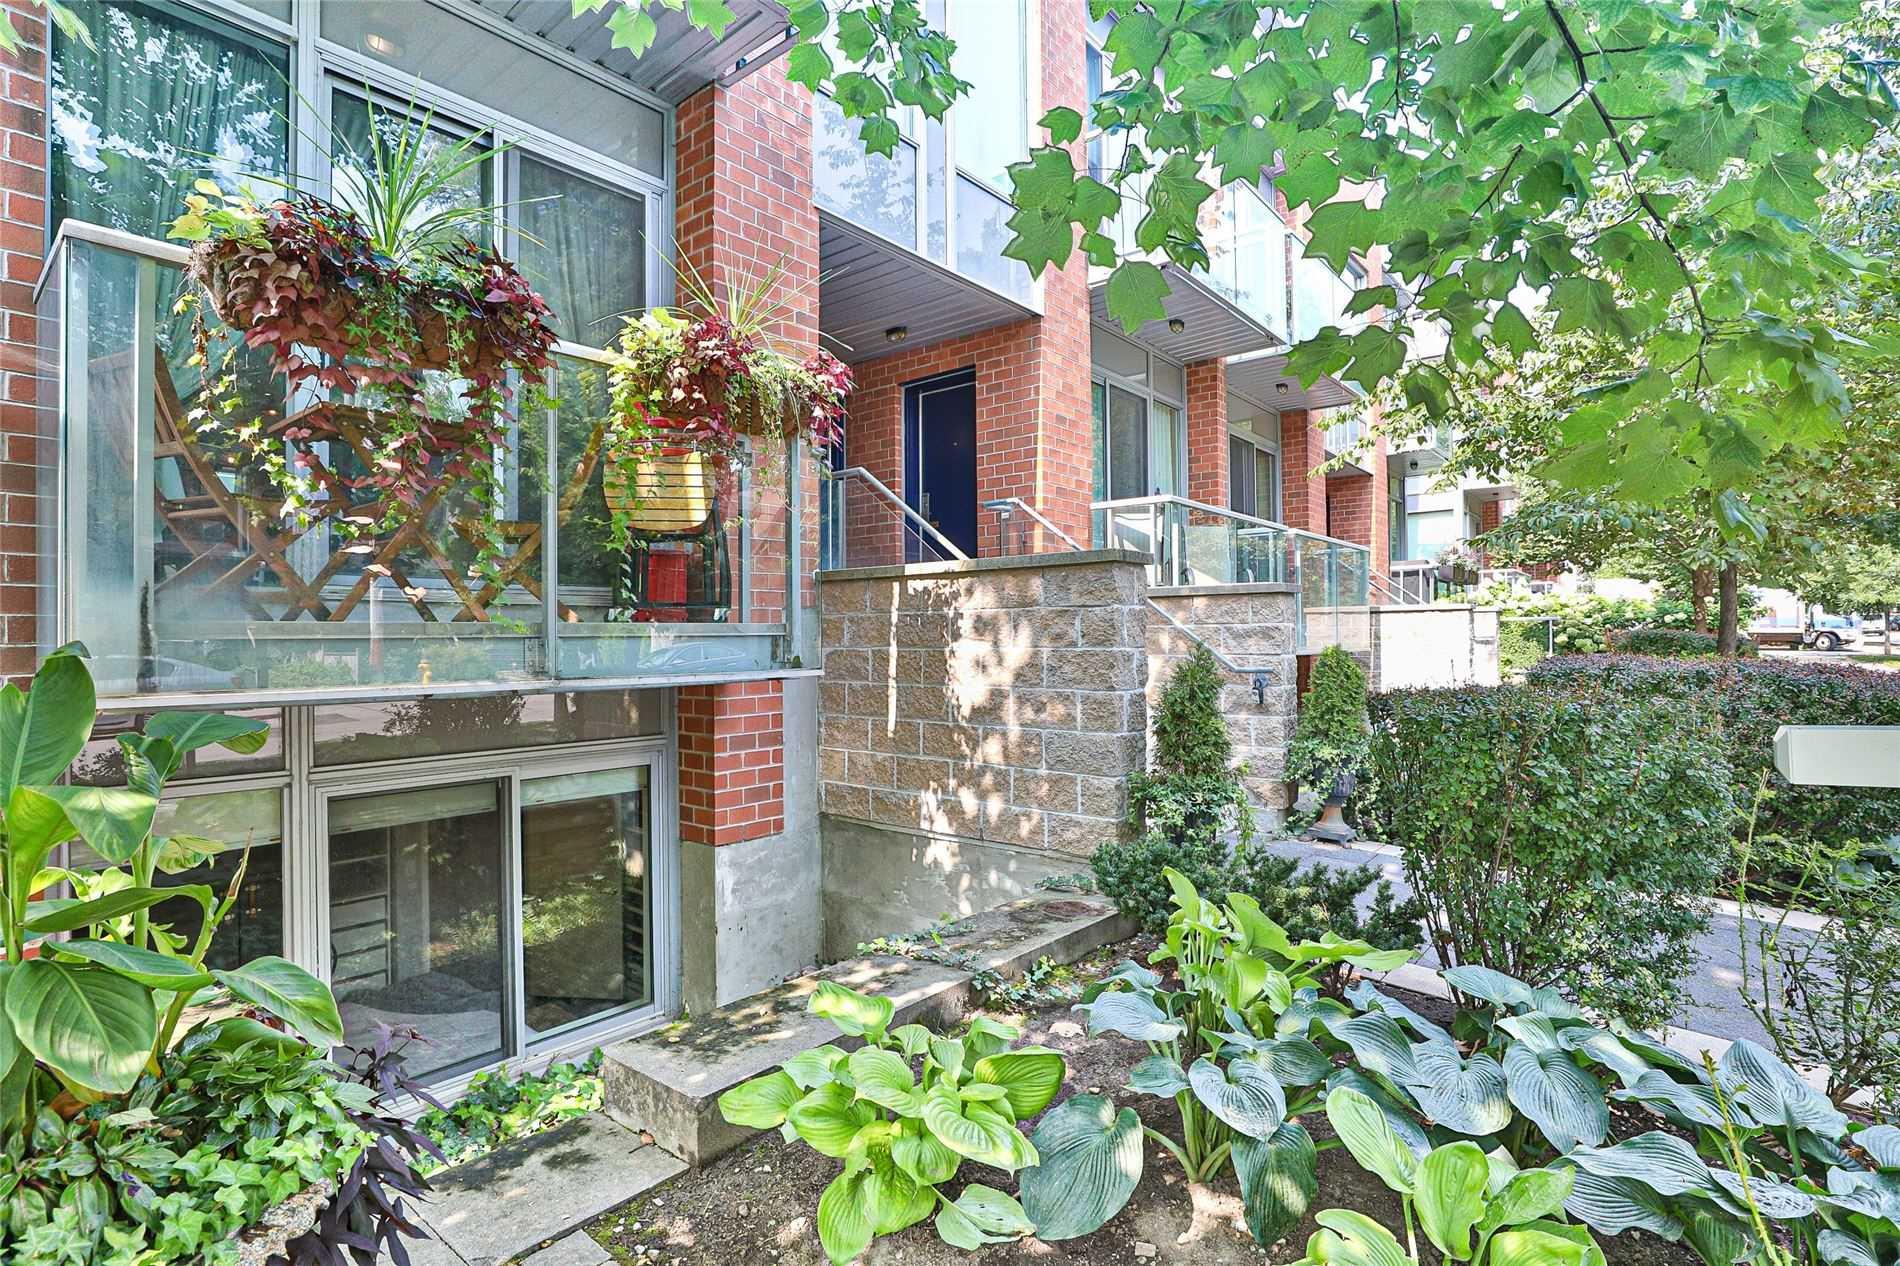 48 Boston Ave, Toronto, Ontario M4M2T9, 2 Bedrooms Bedrooms, 5 Rooms Rooms,2 BathroomsBathrooms,Condo Townhouse,For Sale,Boston,E4916258